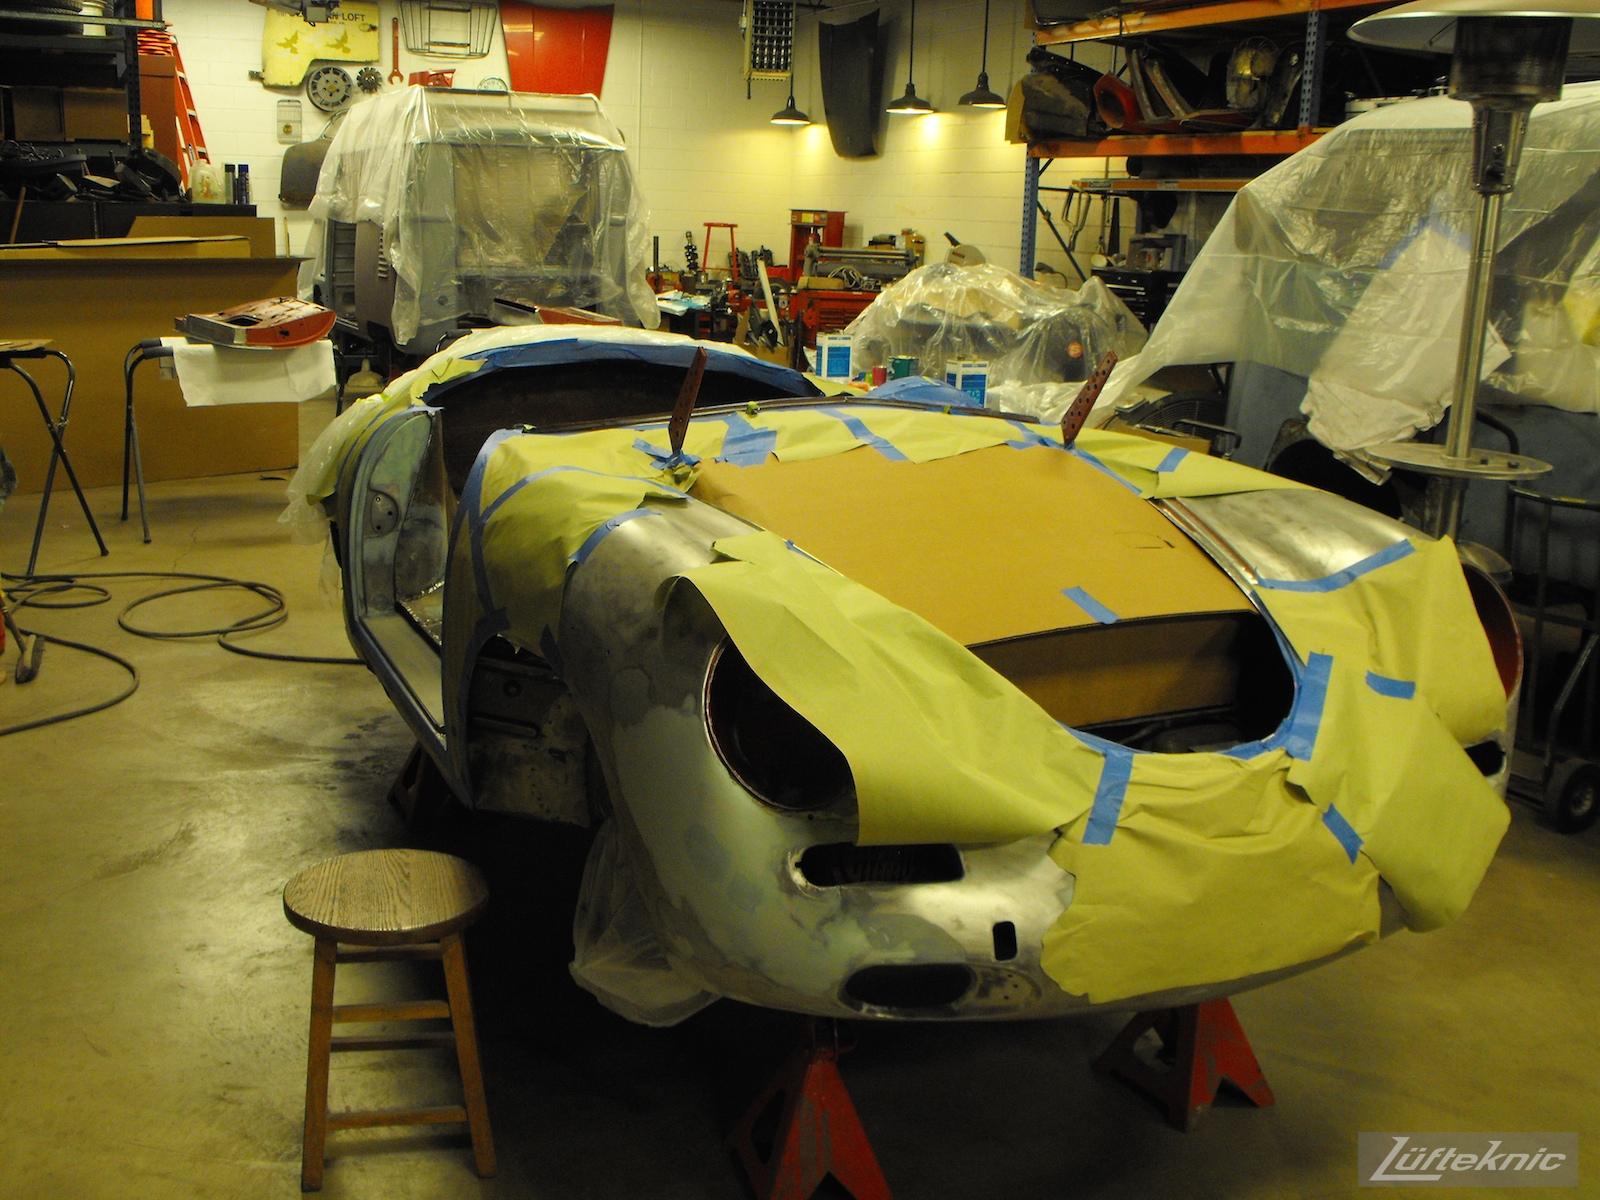 1961 Porsche 356B Roadster restoration.